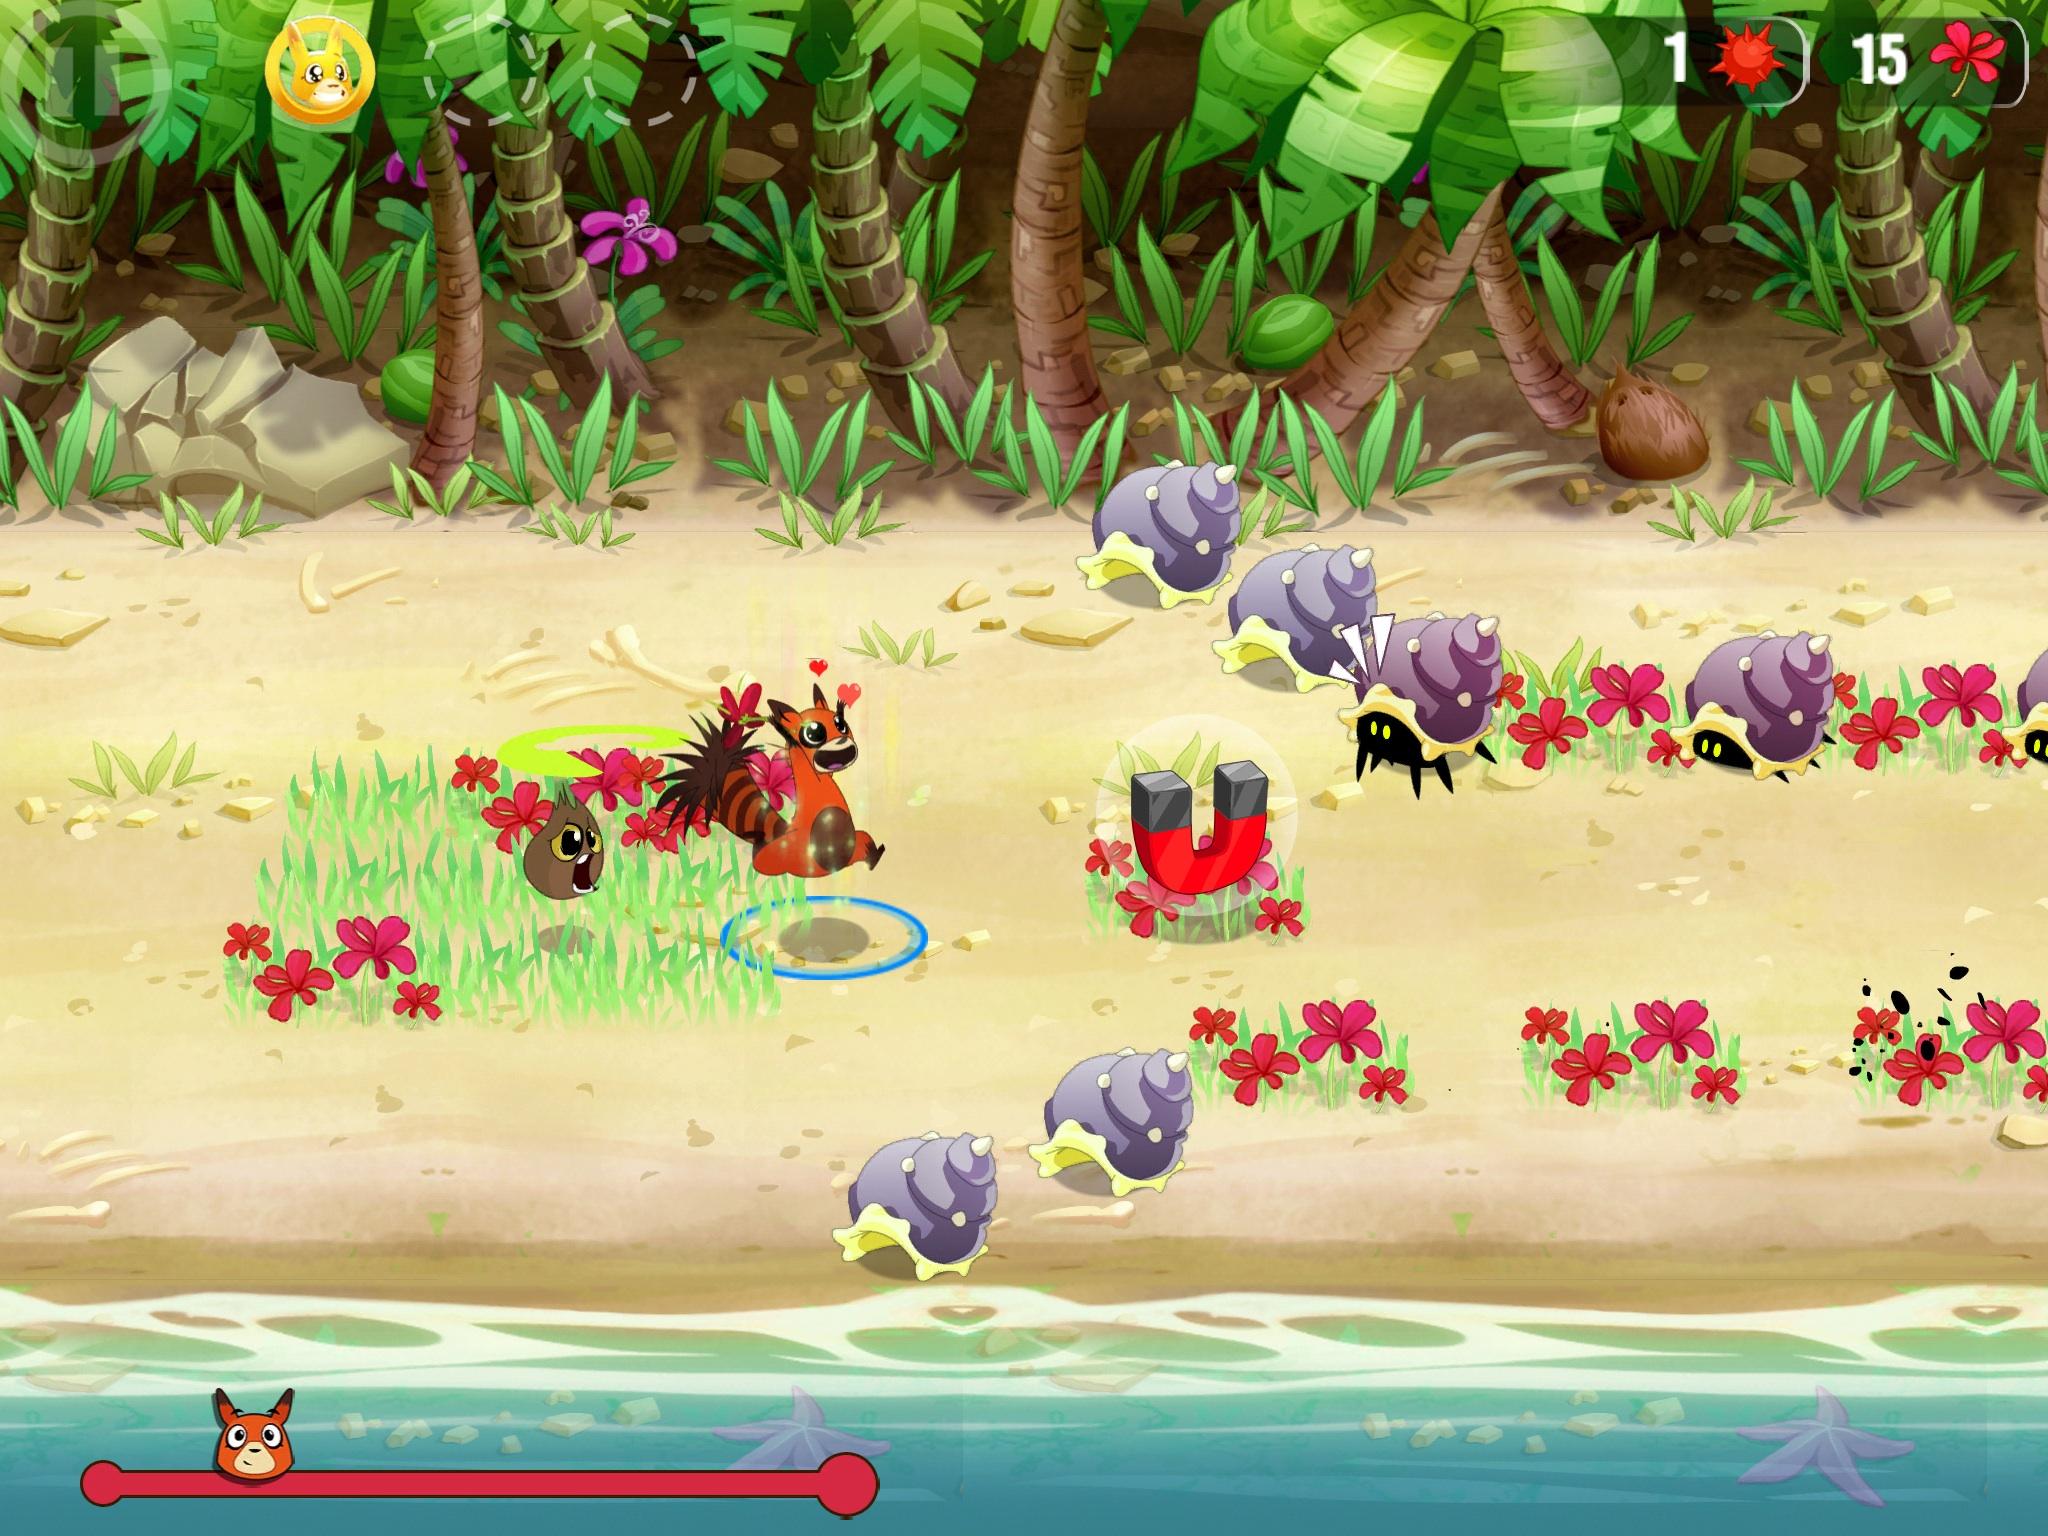 Rakoo's Adventure gets a refreshing update by Playdigious